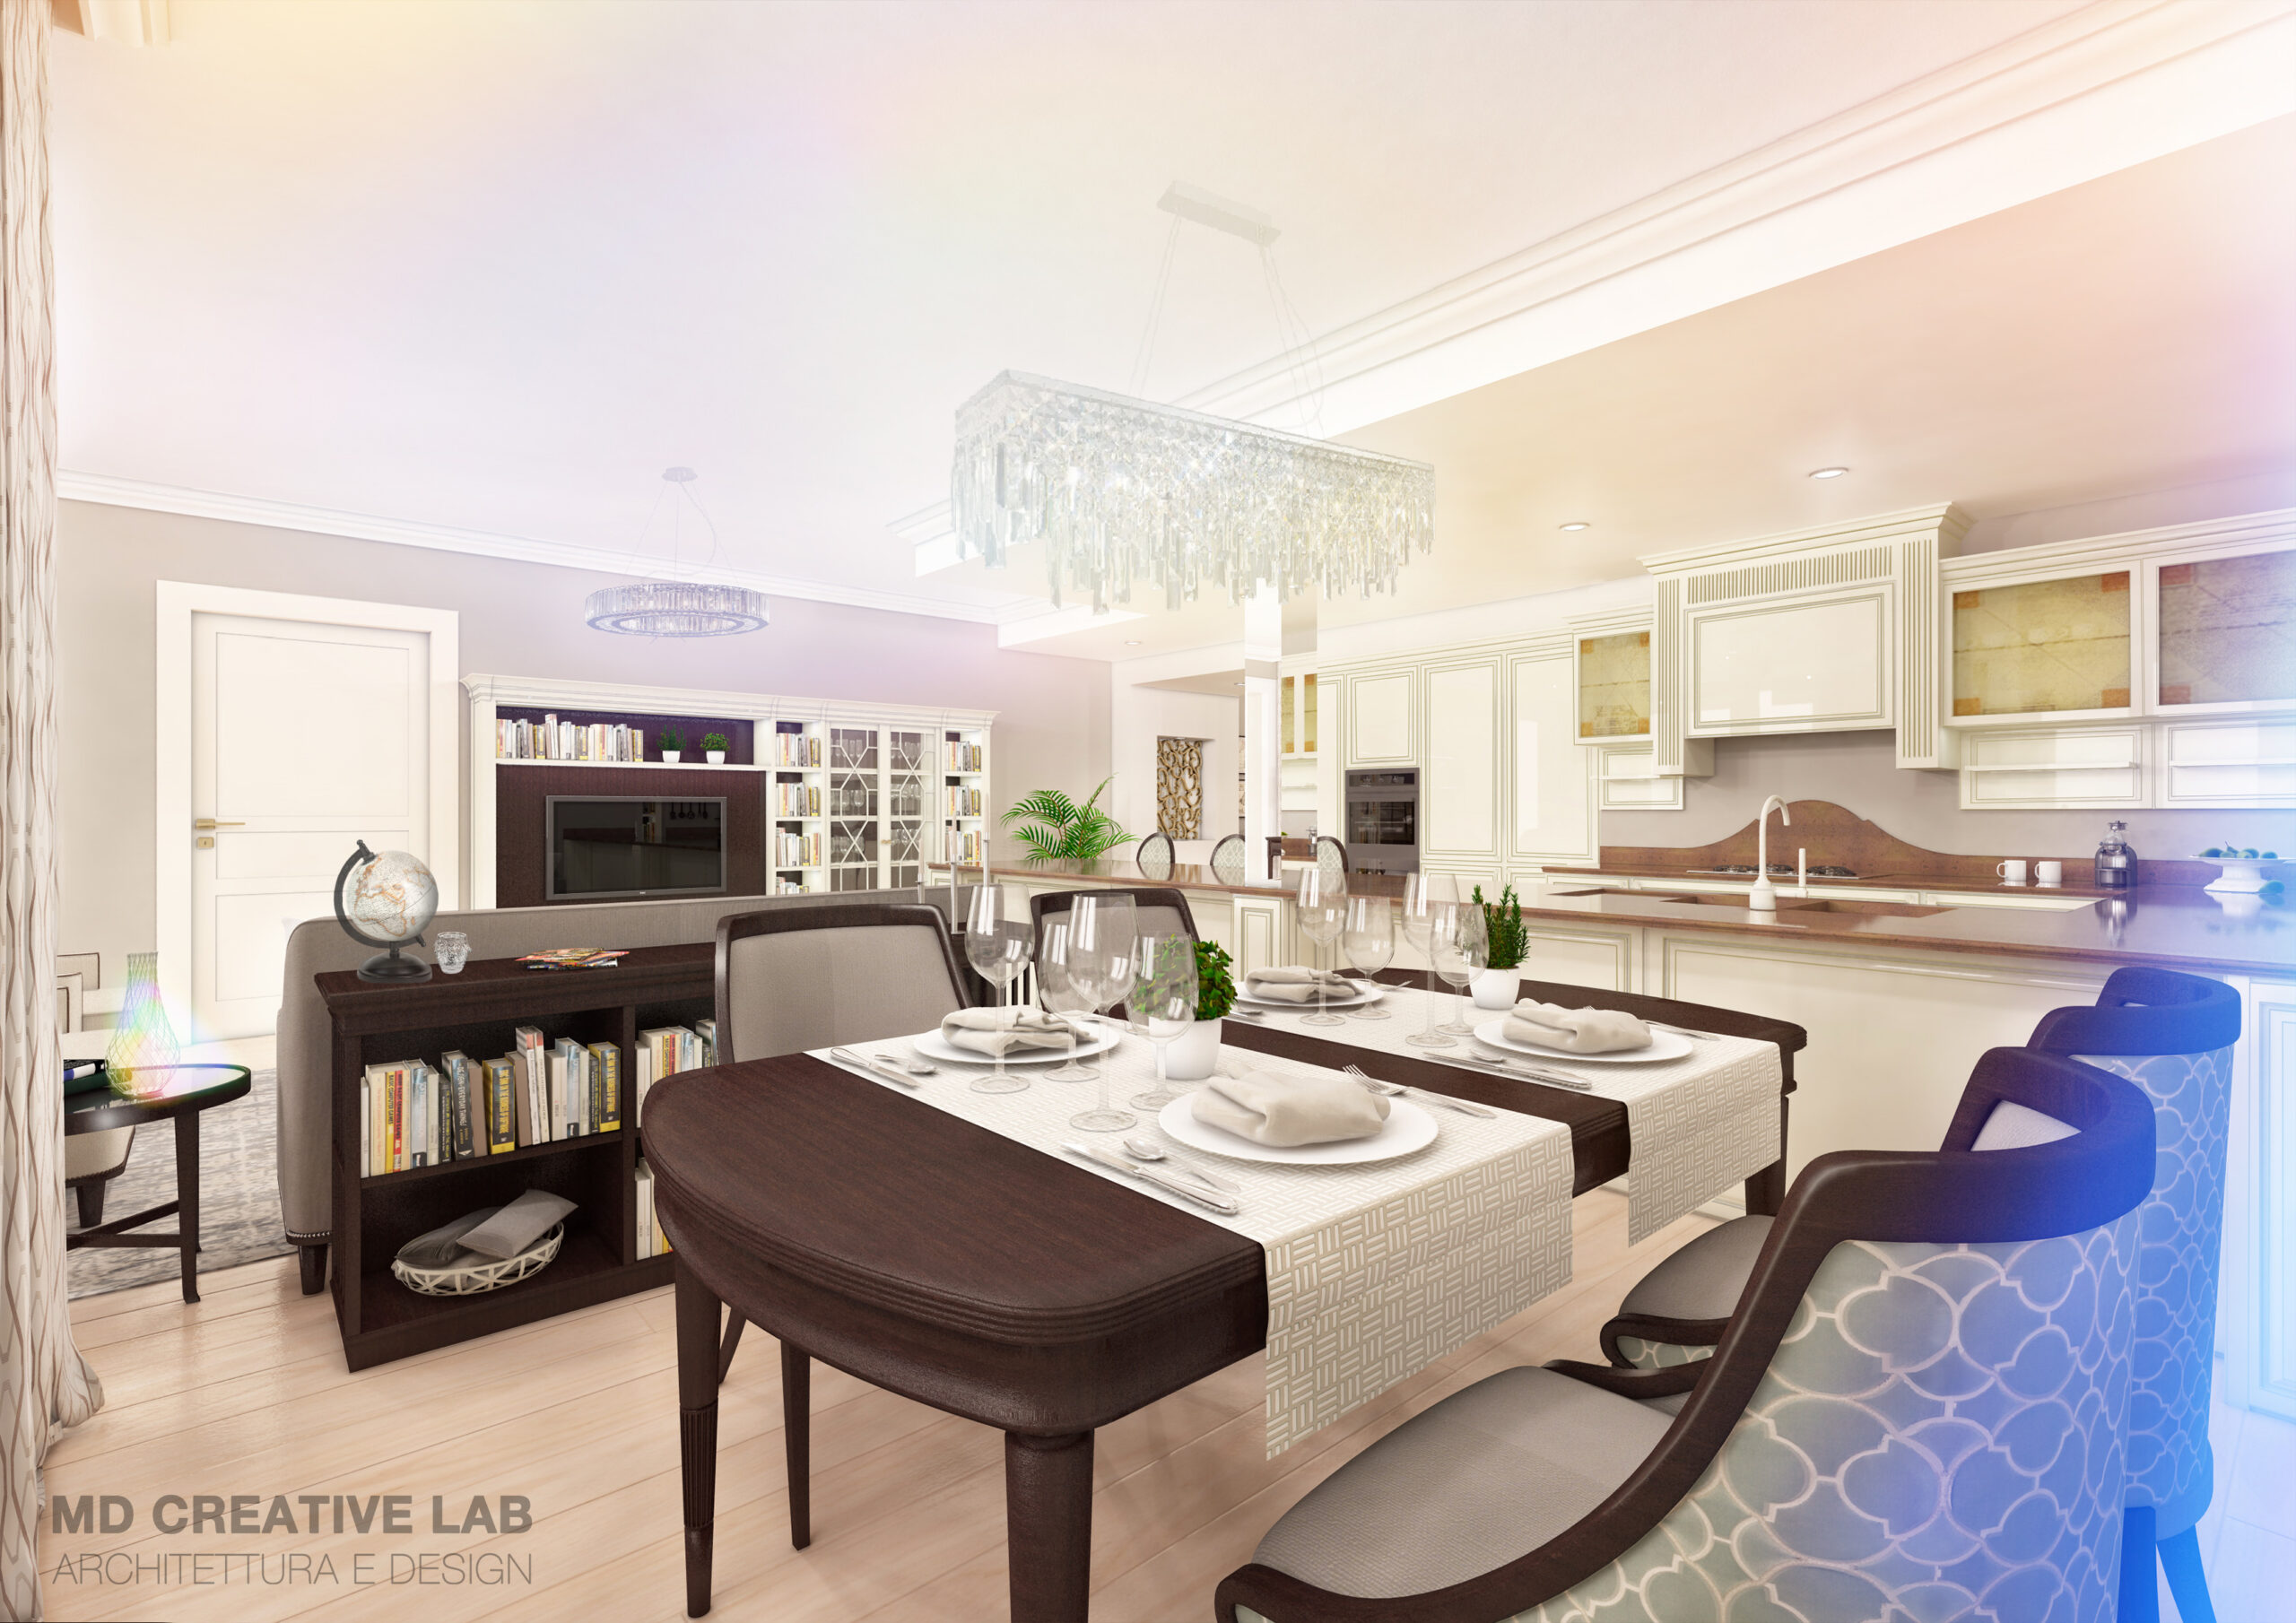 MD Creative Lab Lugano Dining Room design Lugano PAradiso Emerald Living scaled